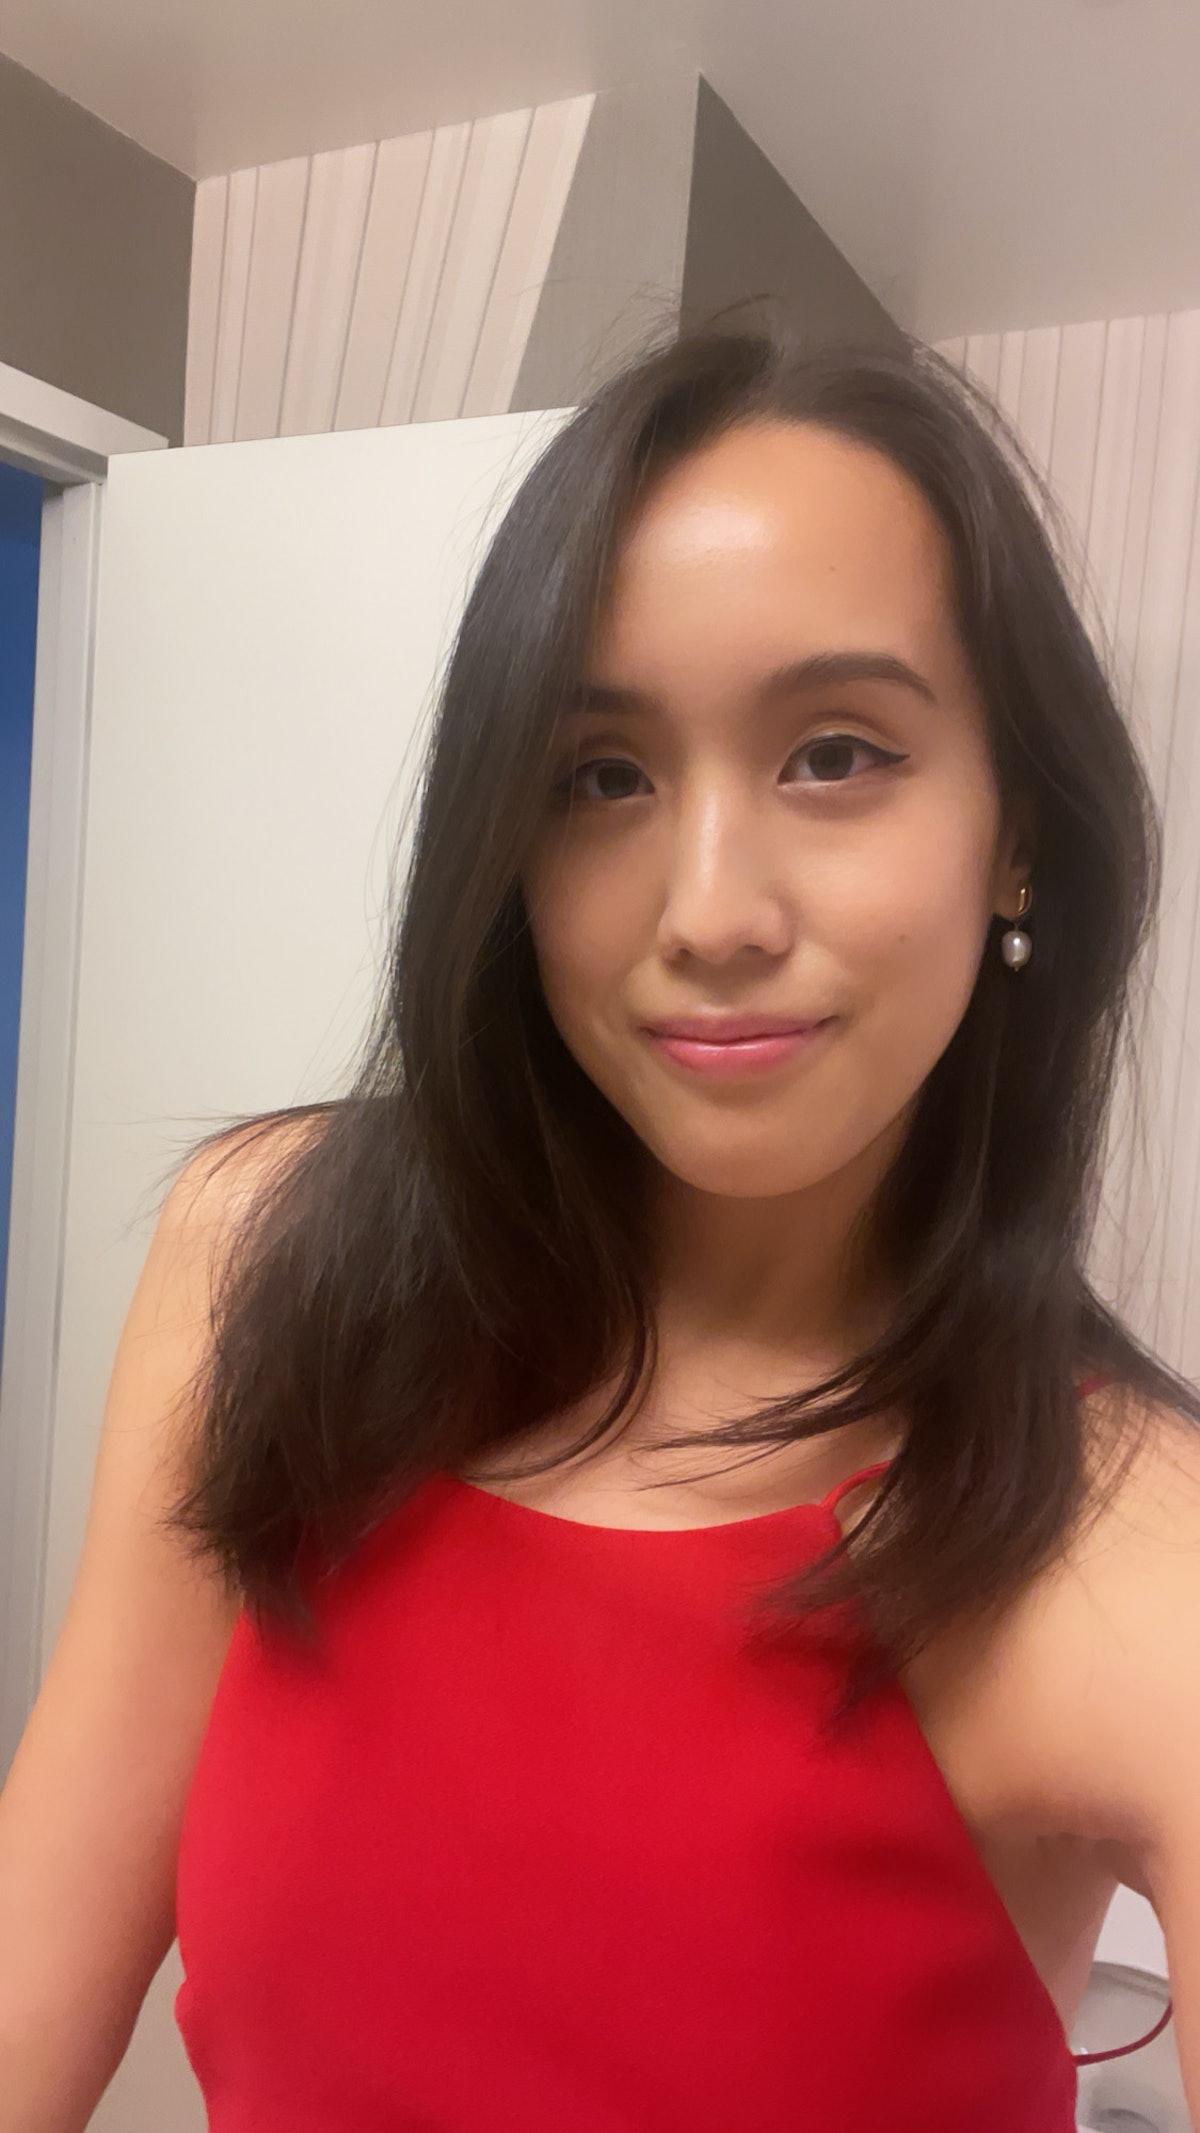 Marina Liao taking a selfie.